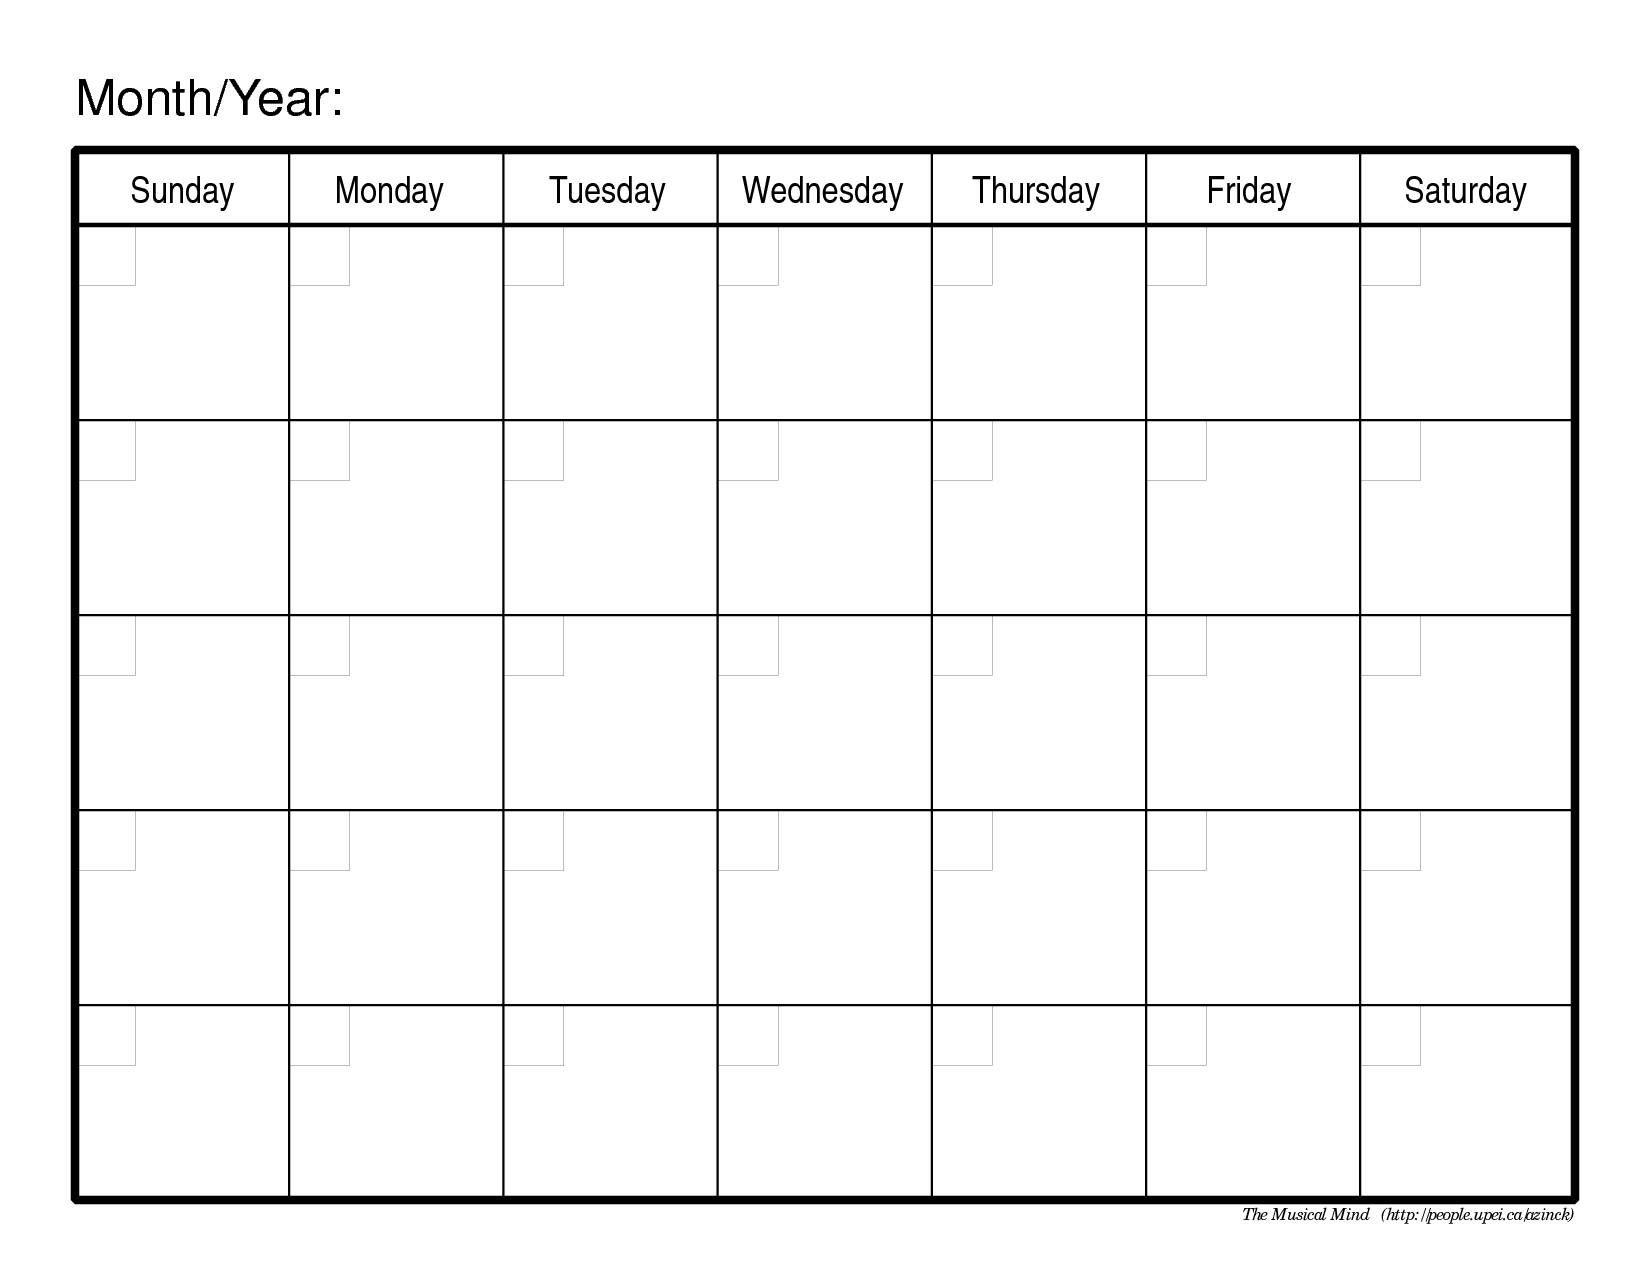 Monthly Calendar Free Printable | Printable Calendar 2014 pertaining to Blank Calendar 2014